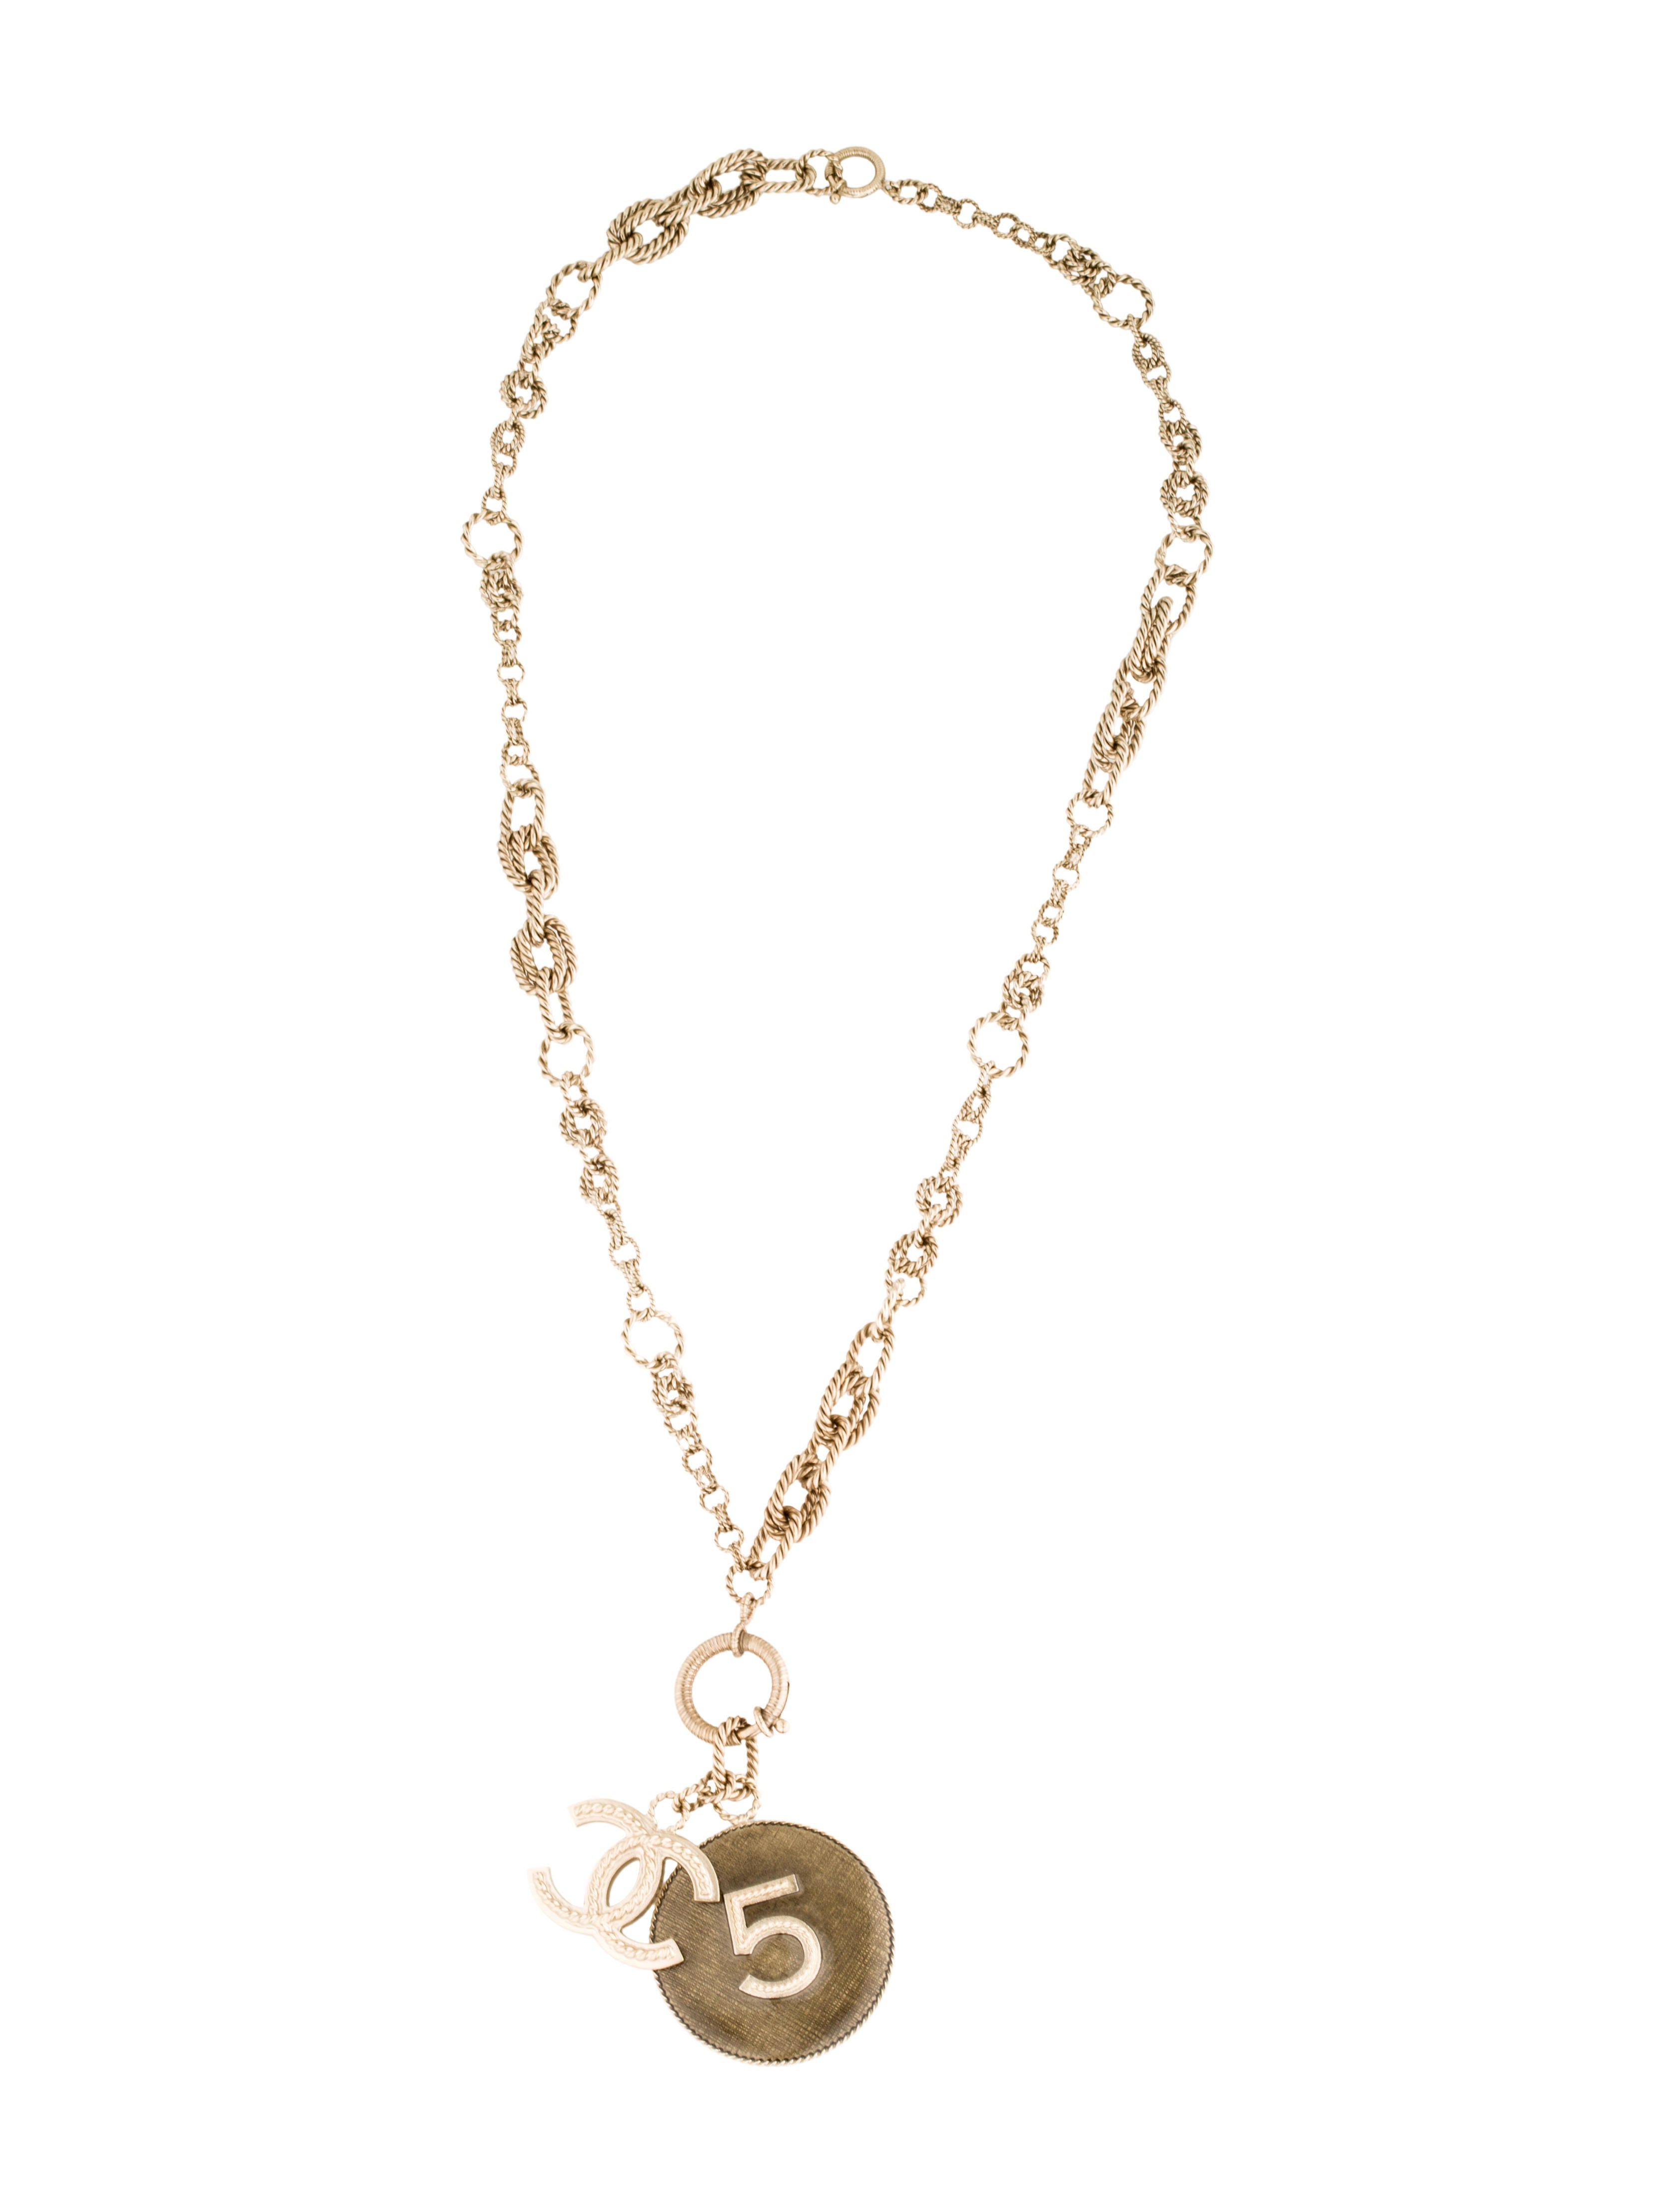 Chanel cc pendant necklace : Chanel lacquered cc no pendant necklace w tags